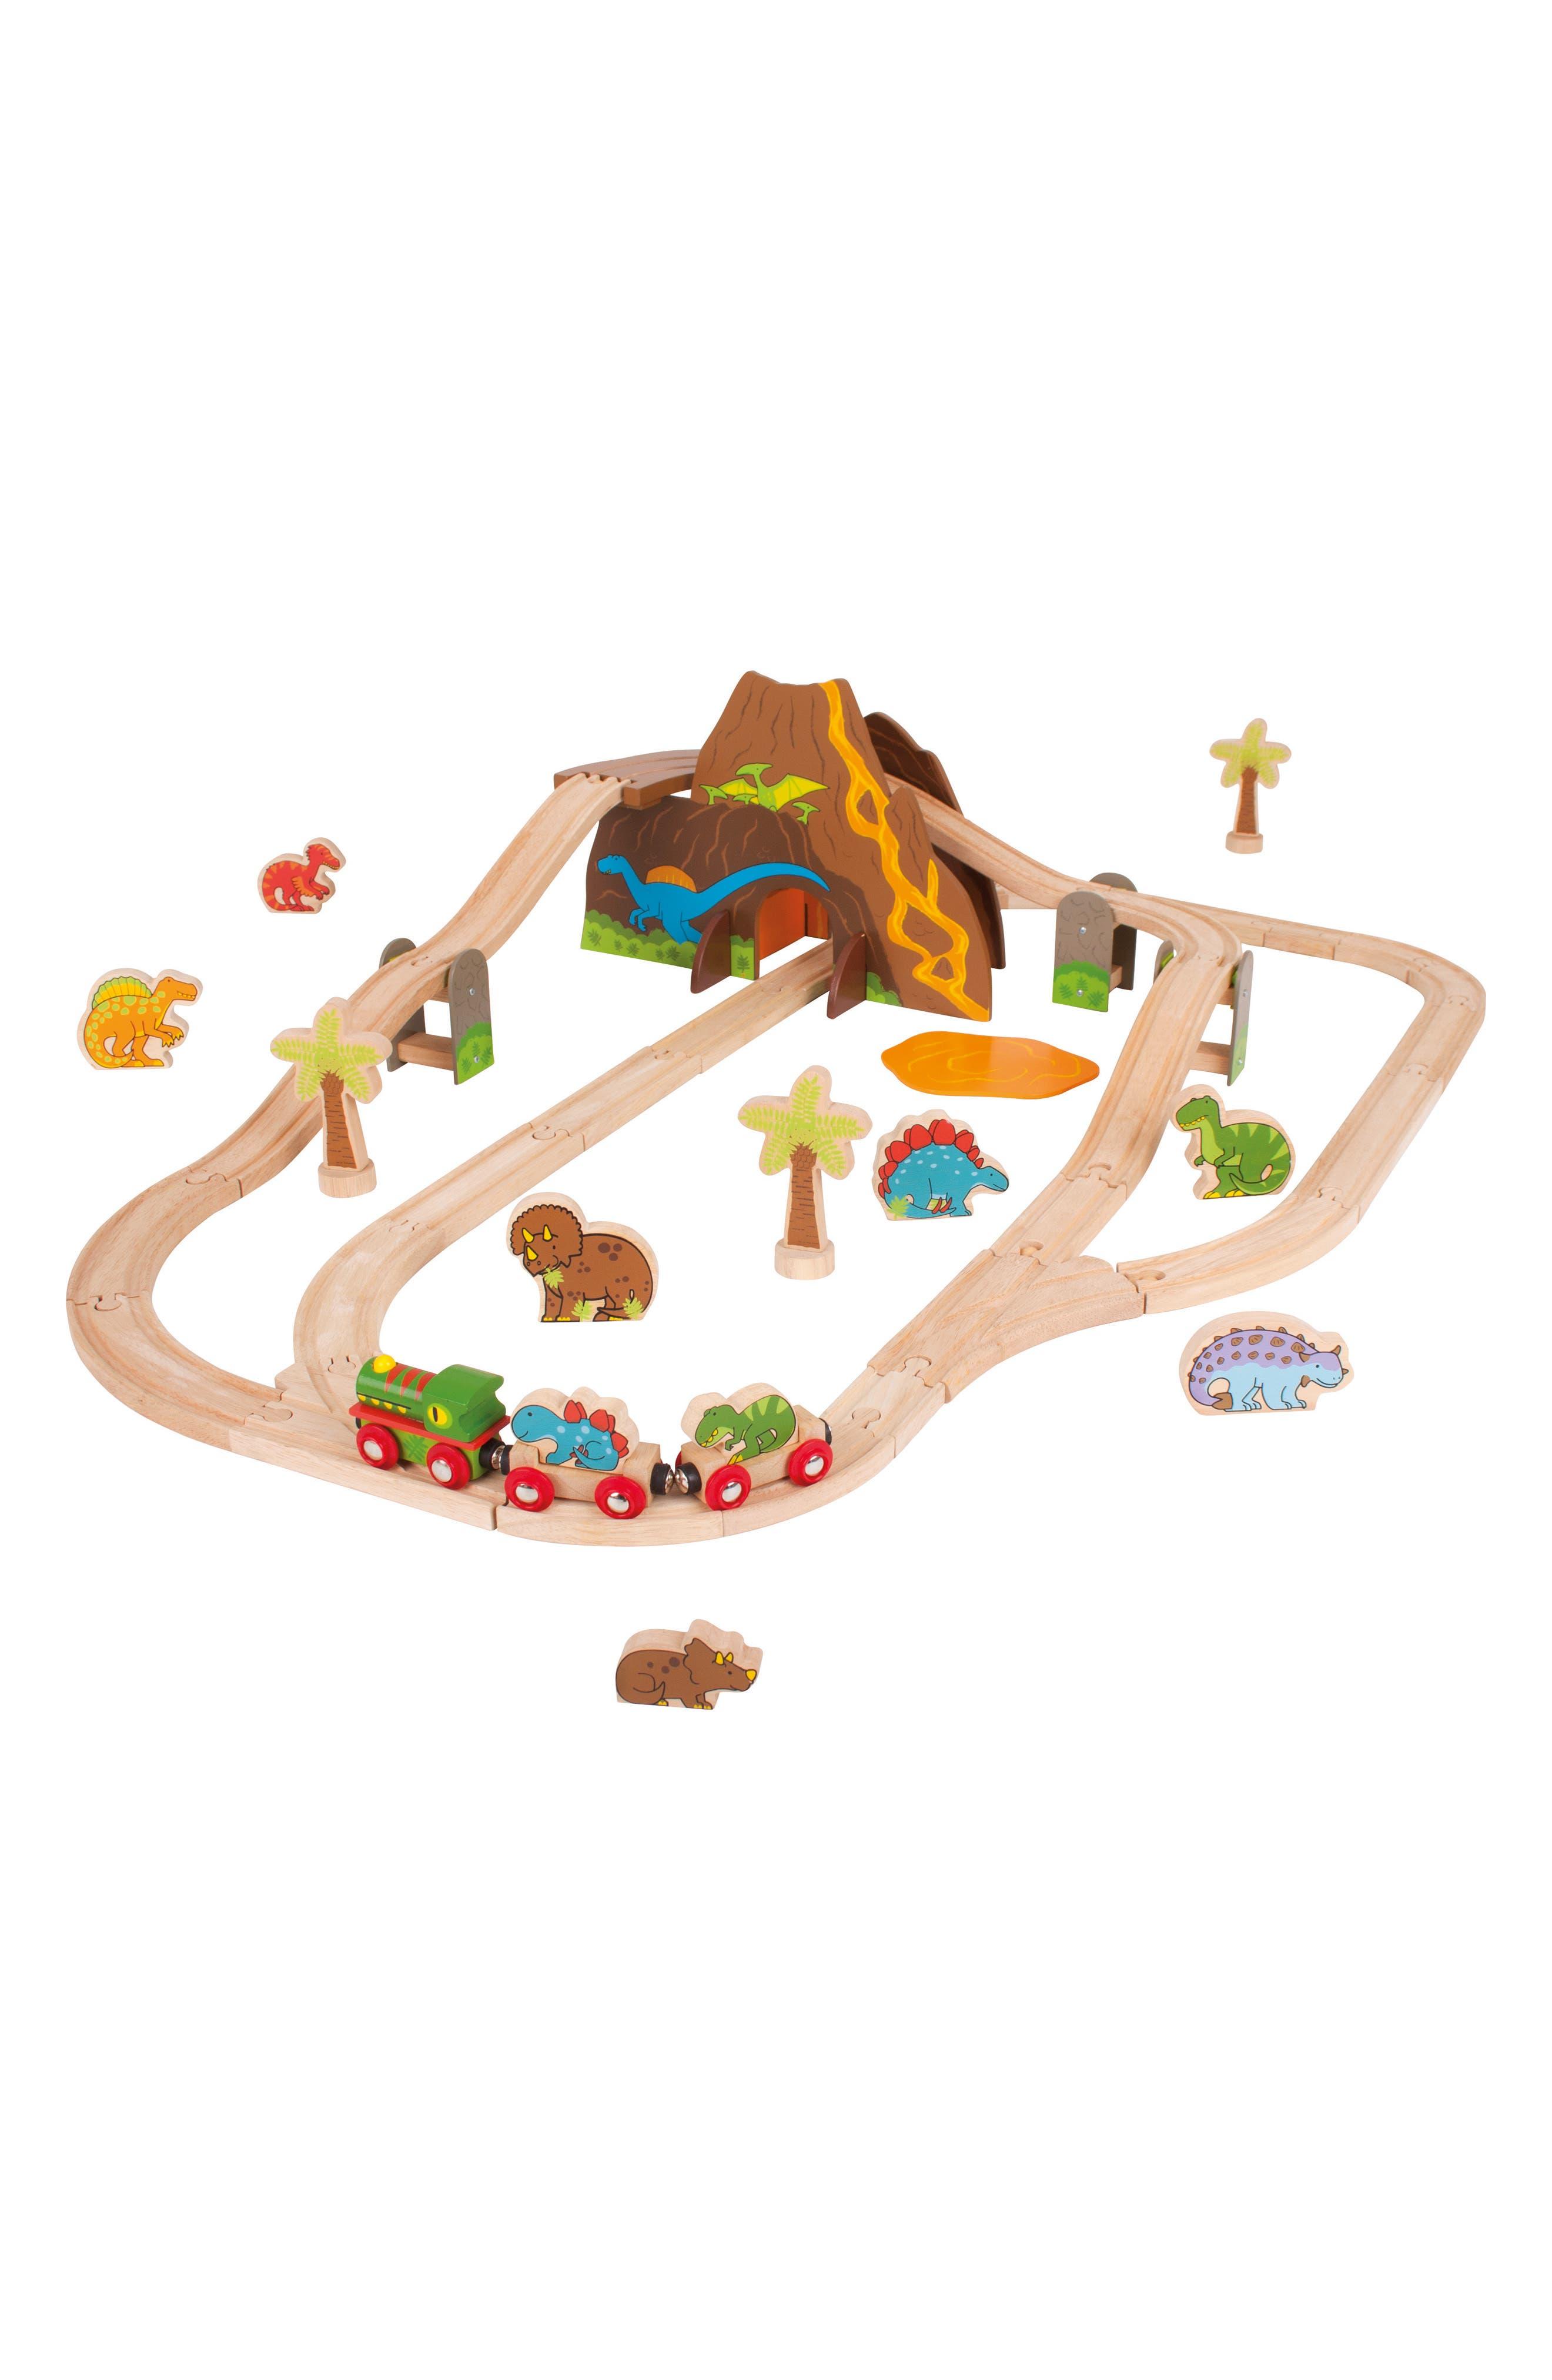 49-Piece Dinosaur Wooden Train Set,                             Main thumbnail 1, color,                             Brown